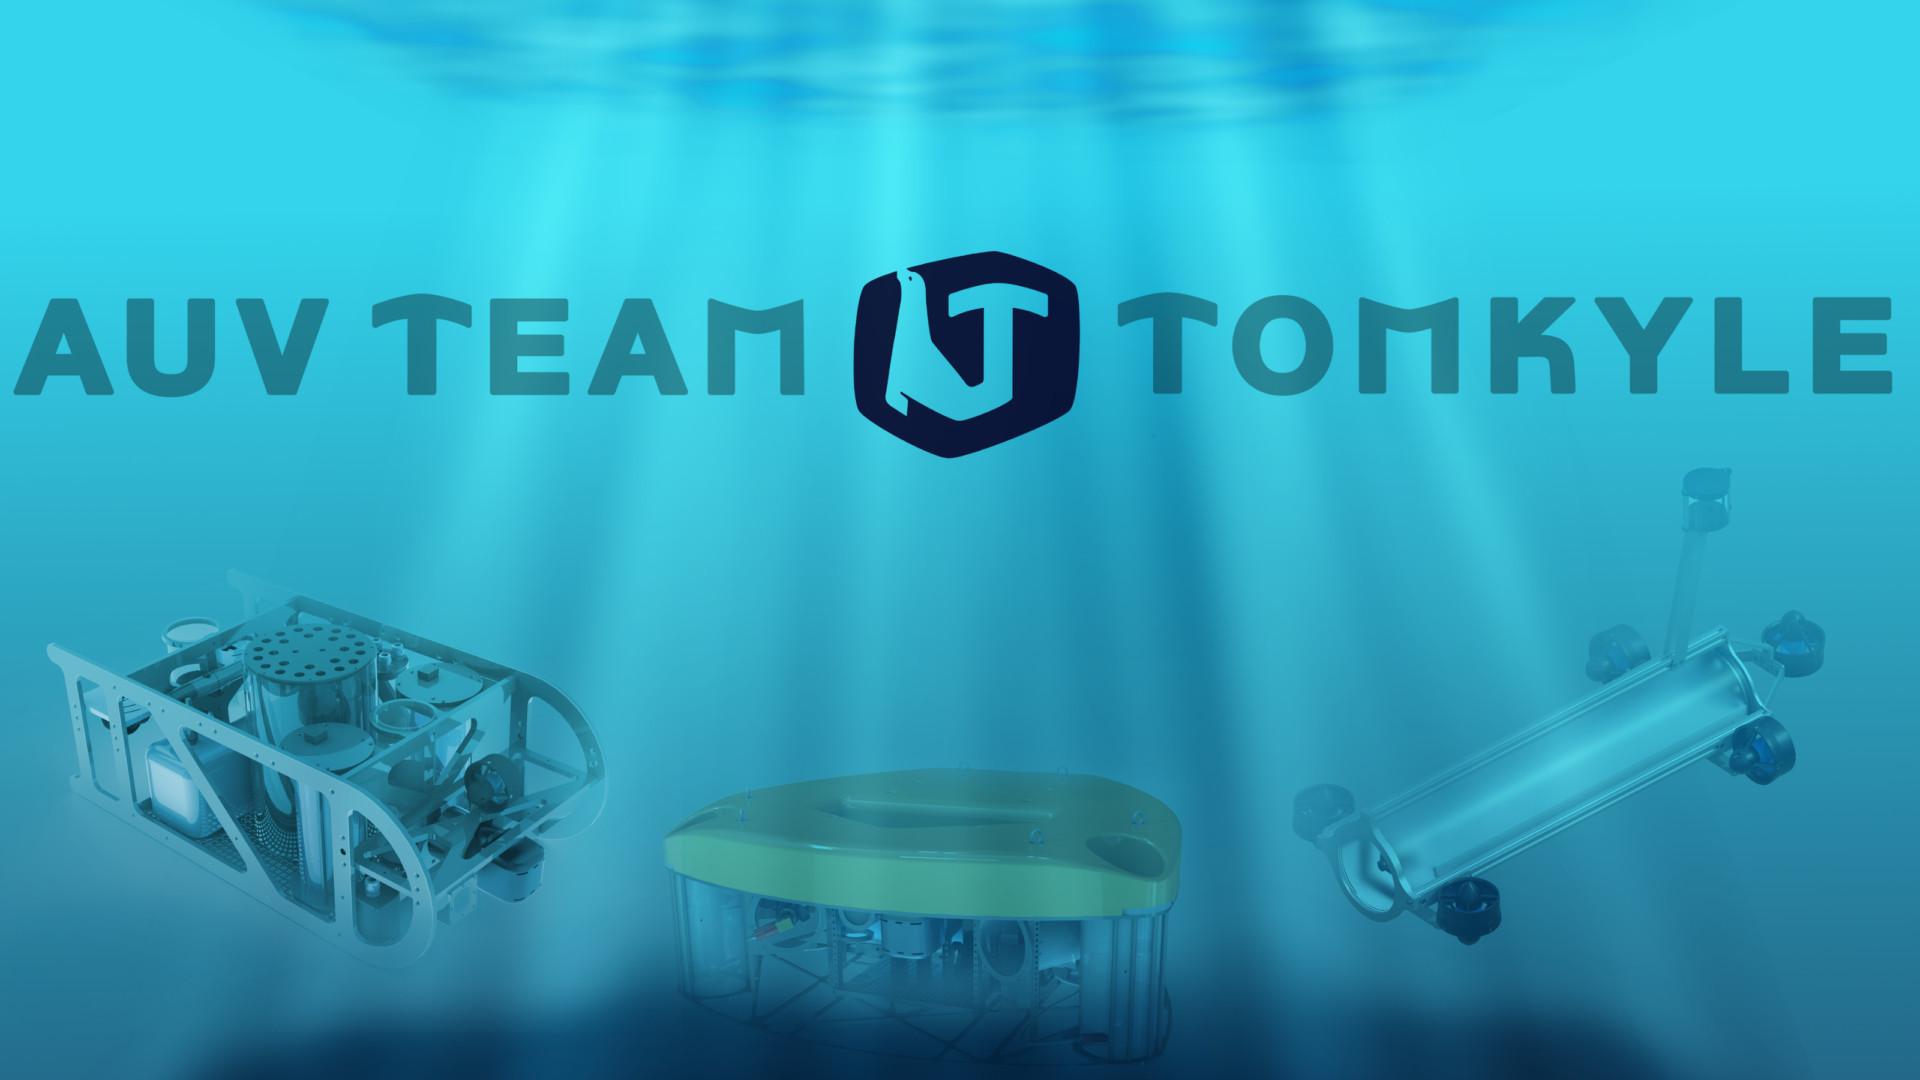 AUV Team TomKyle